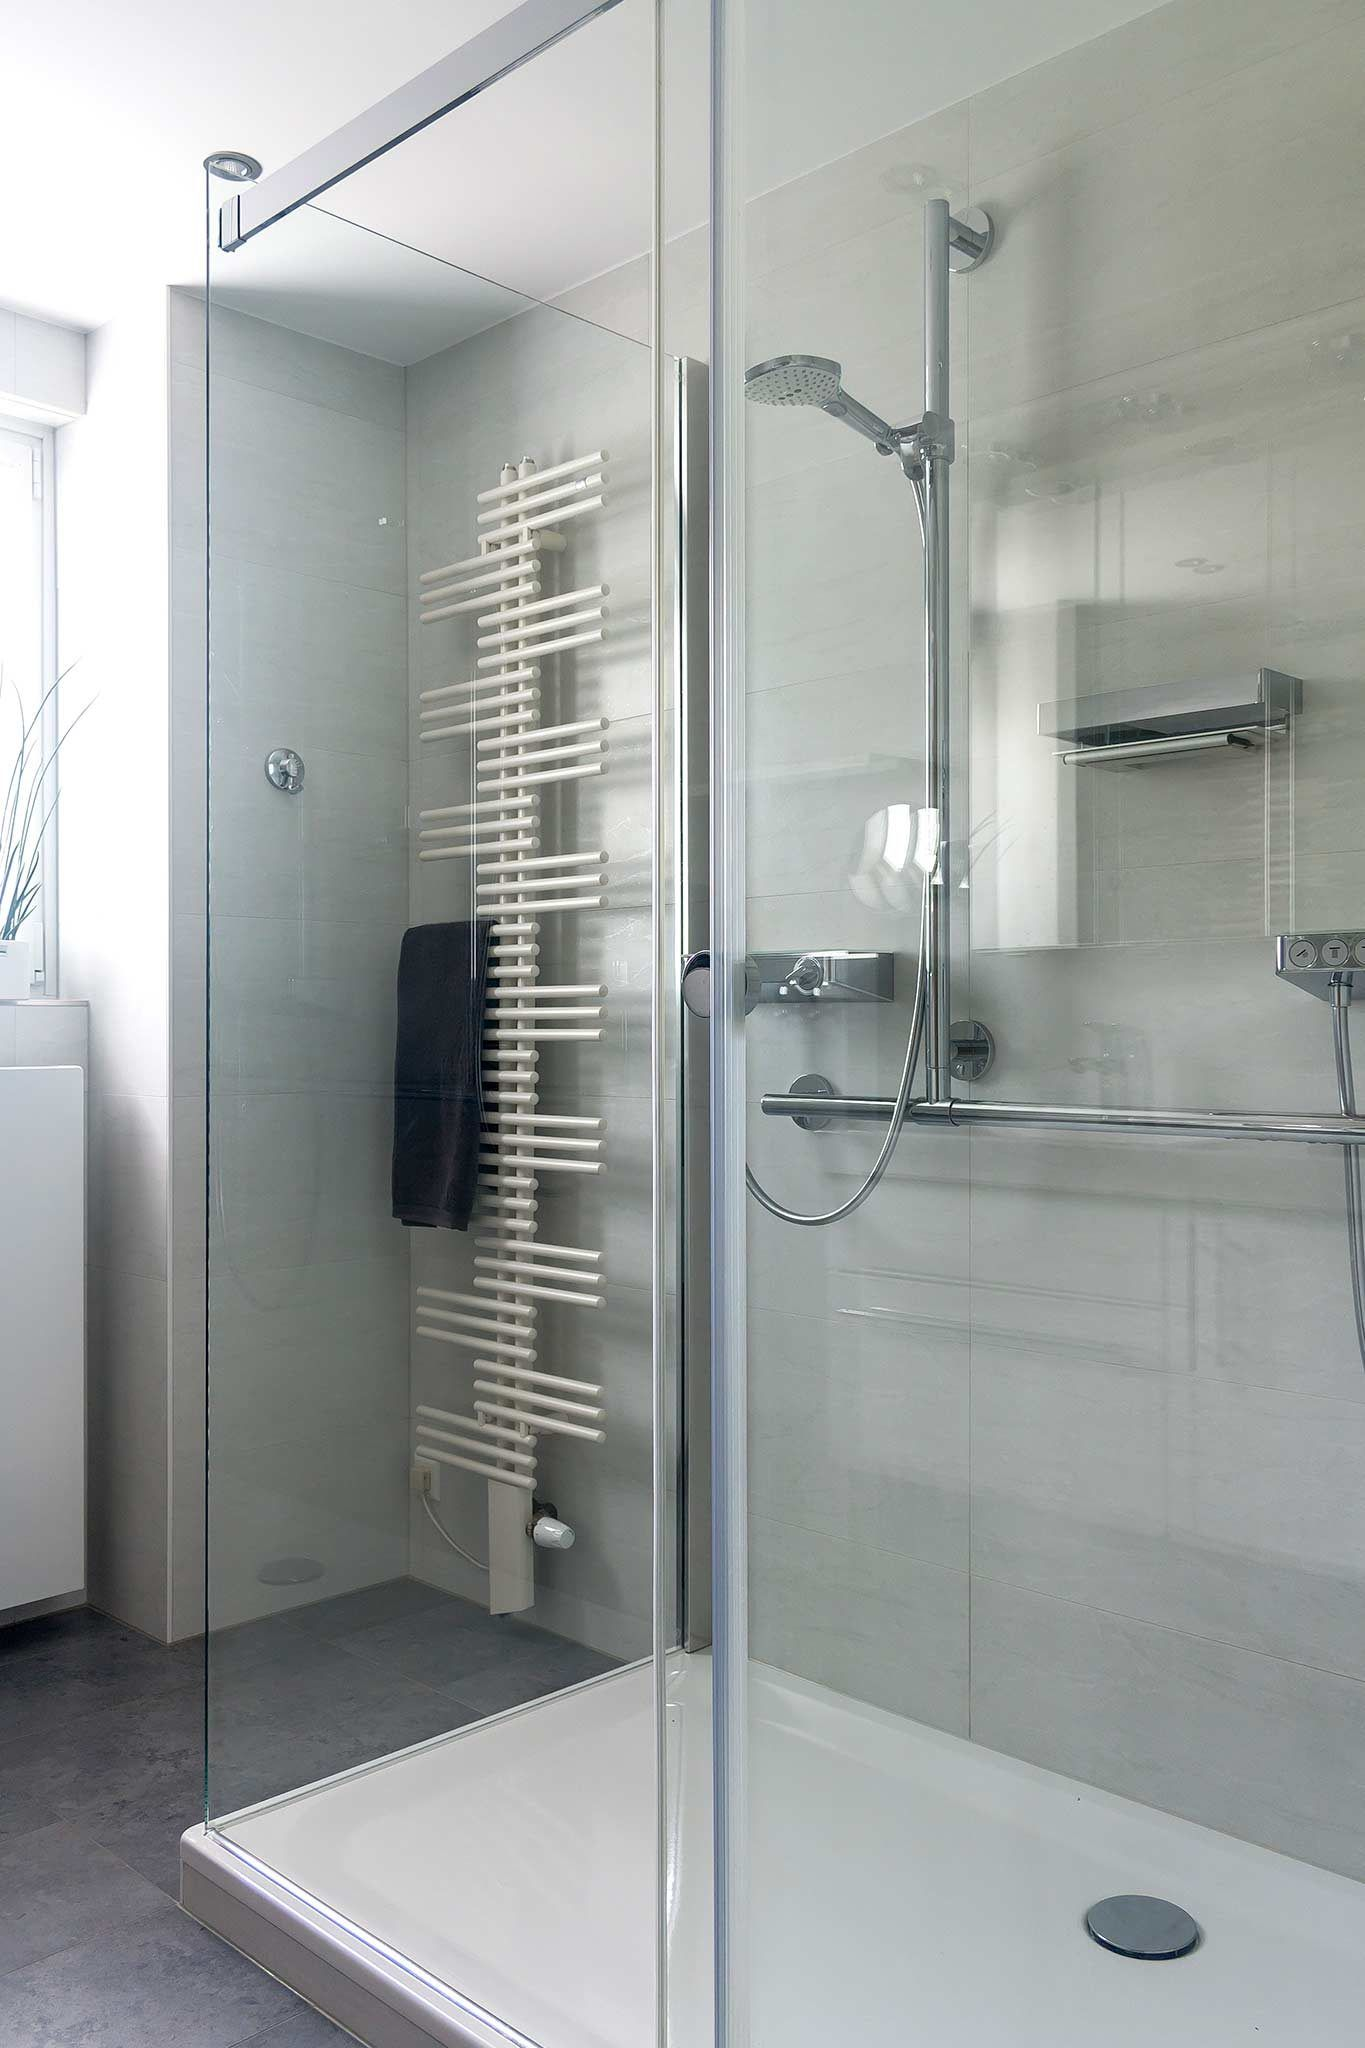 Badezimmer Grosse Dusche Badezimmer Badgestaltung